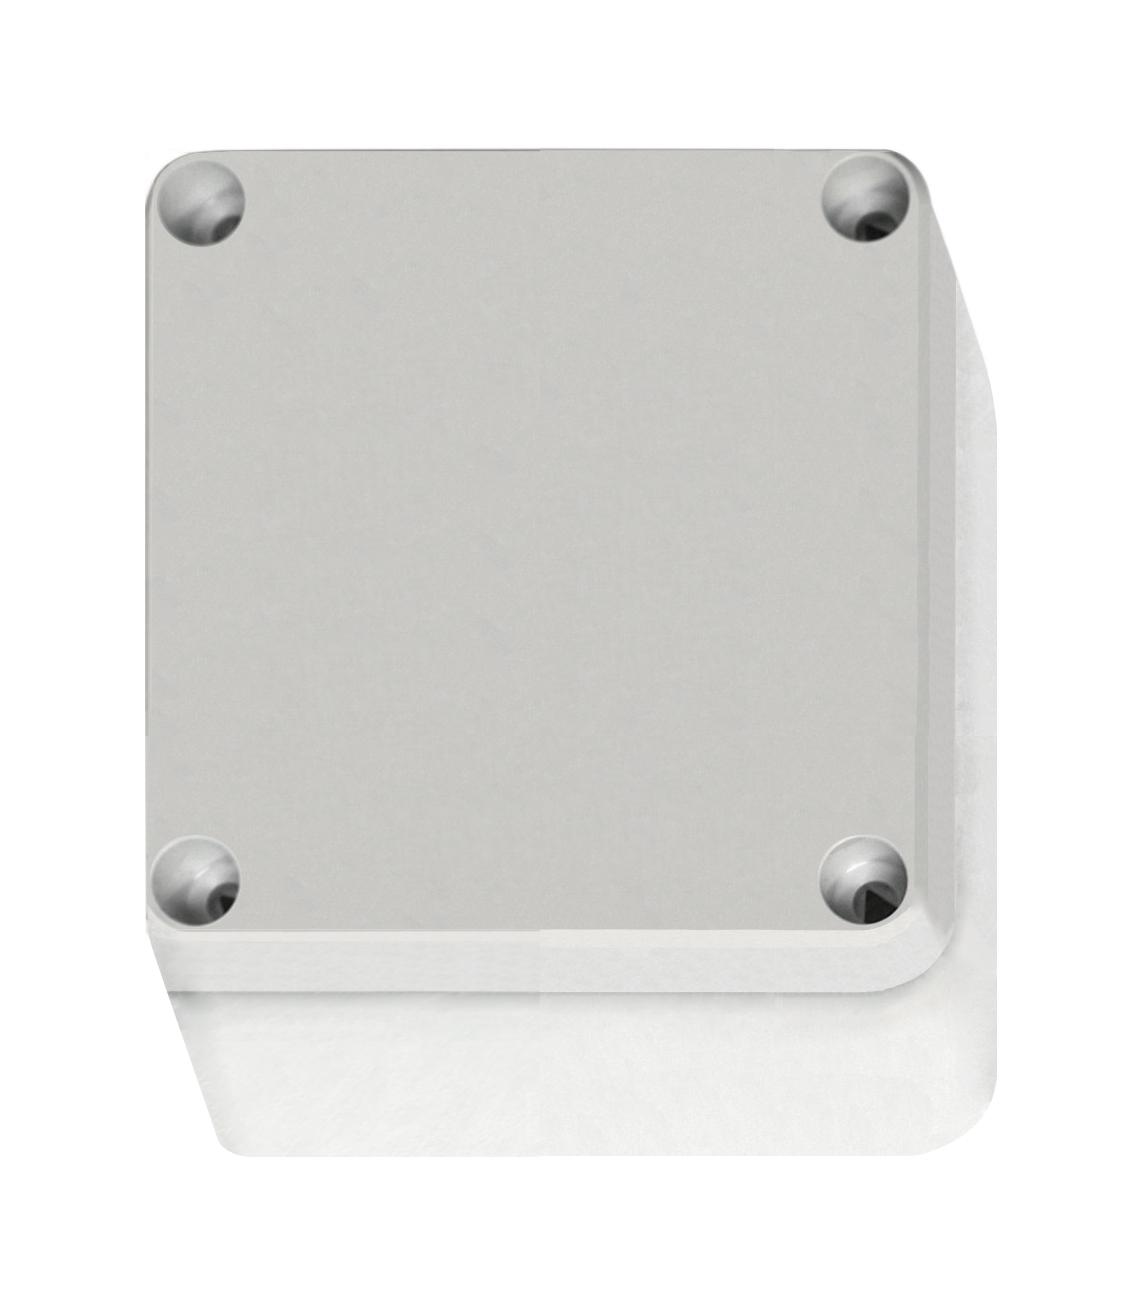 1 Stk ABS Gehäuse mit Deckel grau, 110x110x65mm, RAL7035 IG707001--